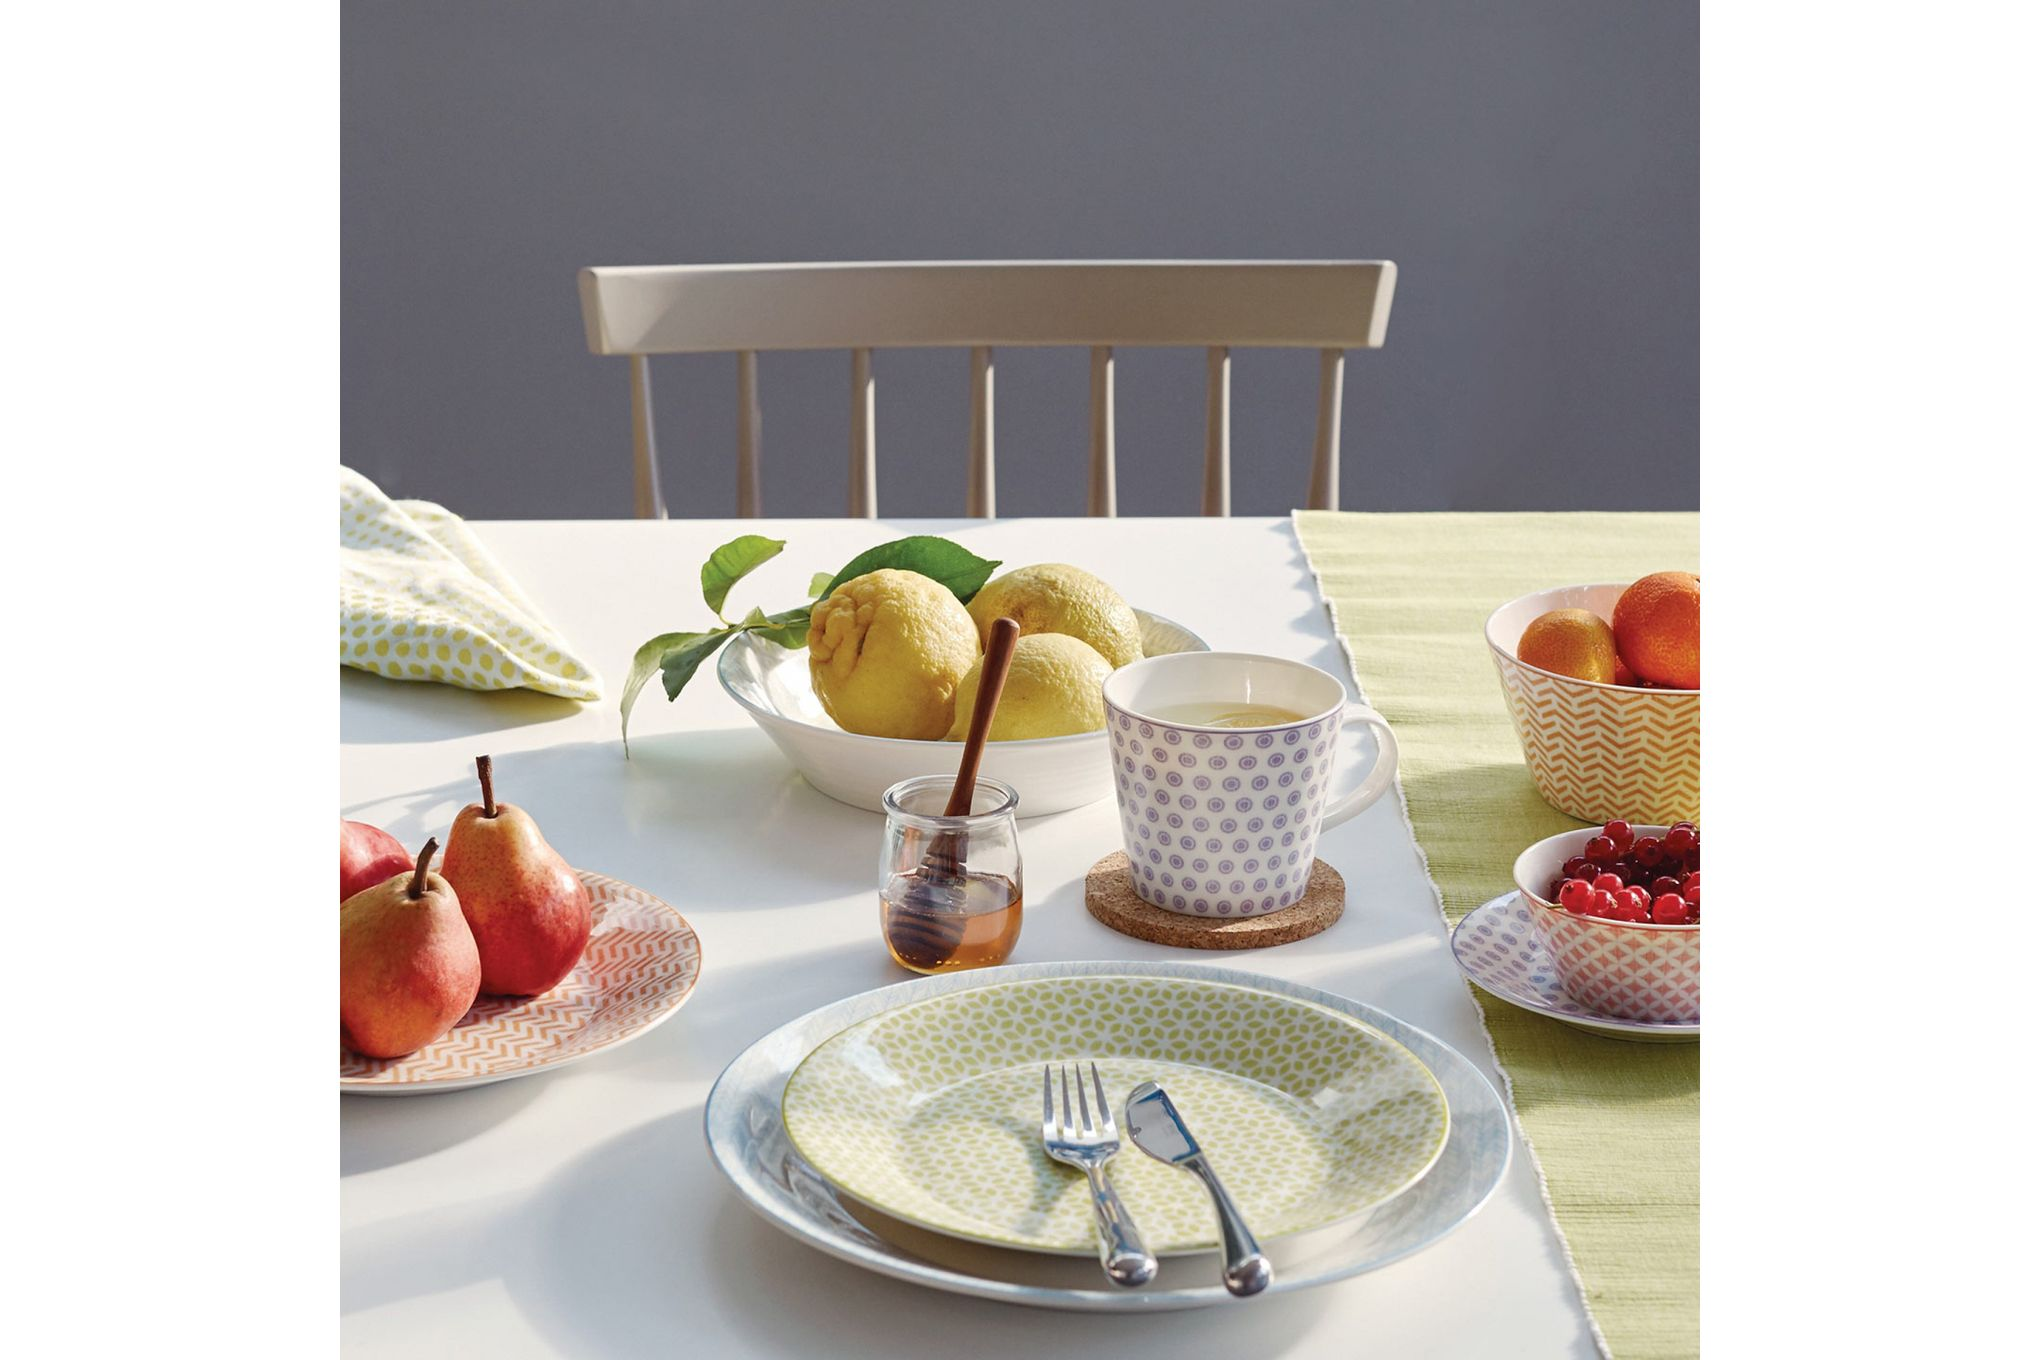 Royal Doulton Pastels Bowl - Set of 4 Accent 11cm thumb 2